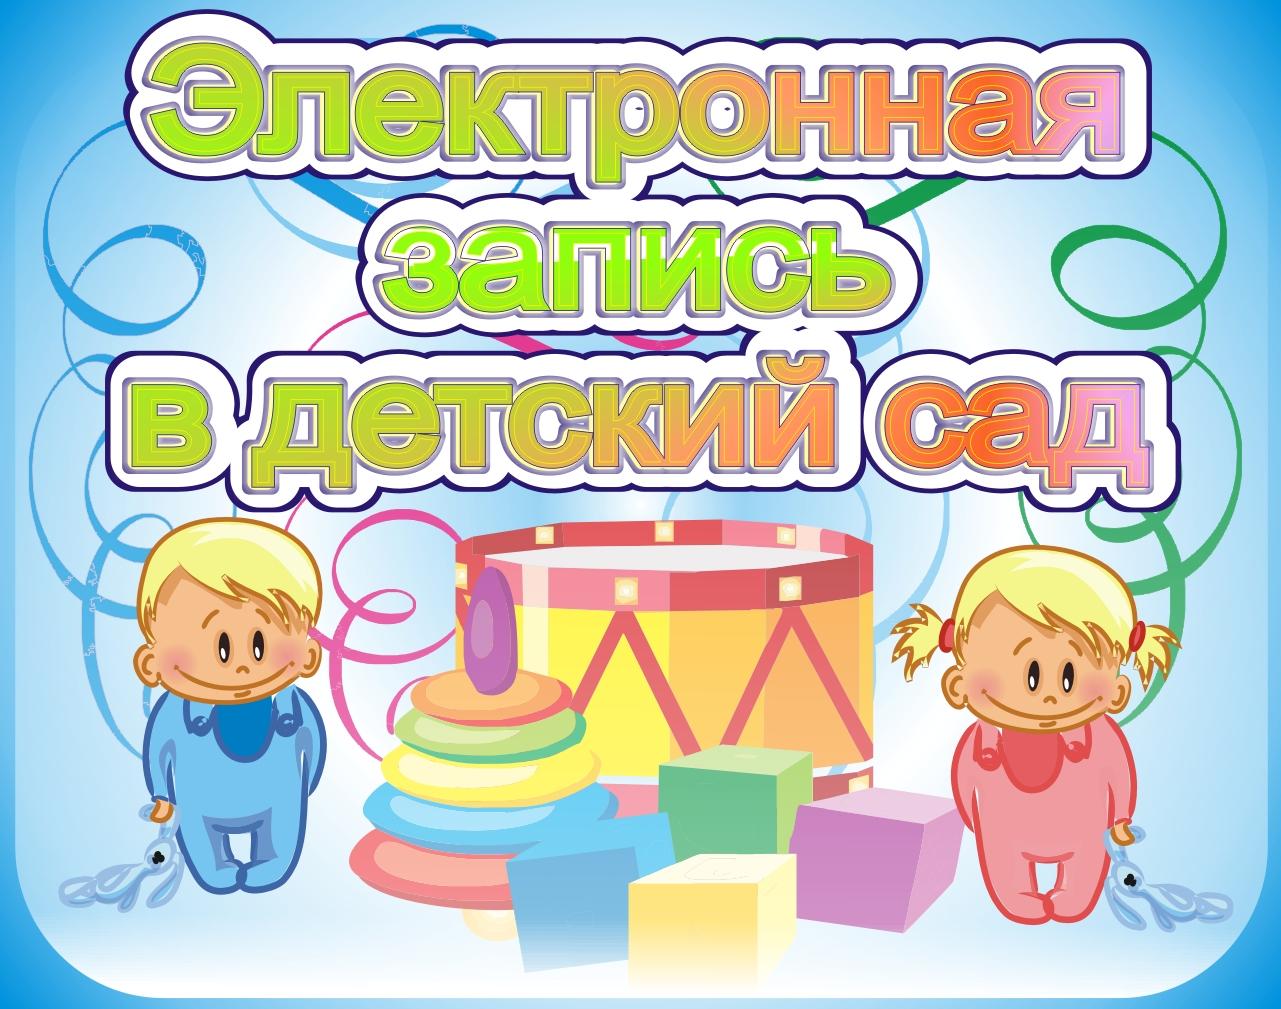 детский сад_электронная запись.jpg